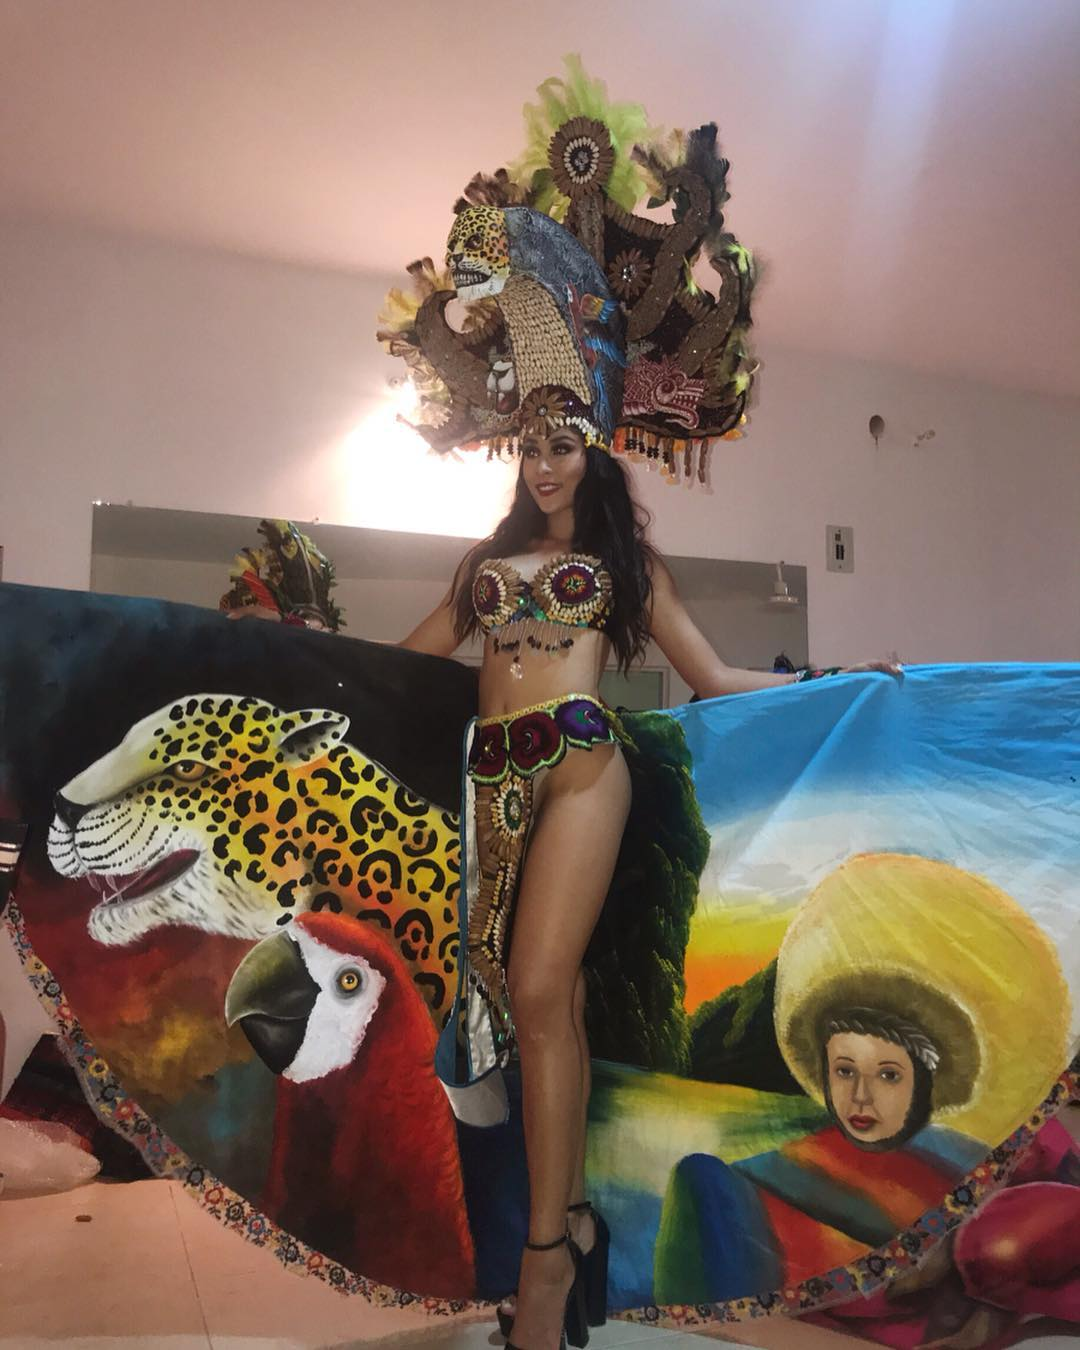 ivanna lobato barradas, top 20 de miss intercontinental 2018-2019. W9bizw10